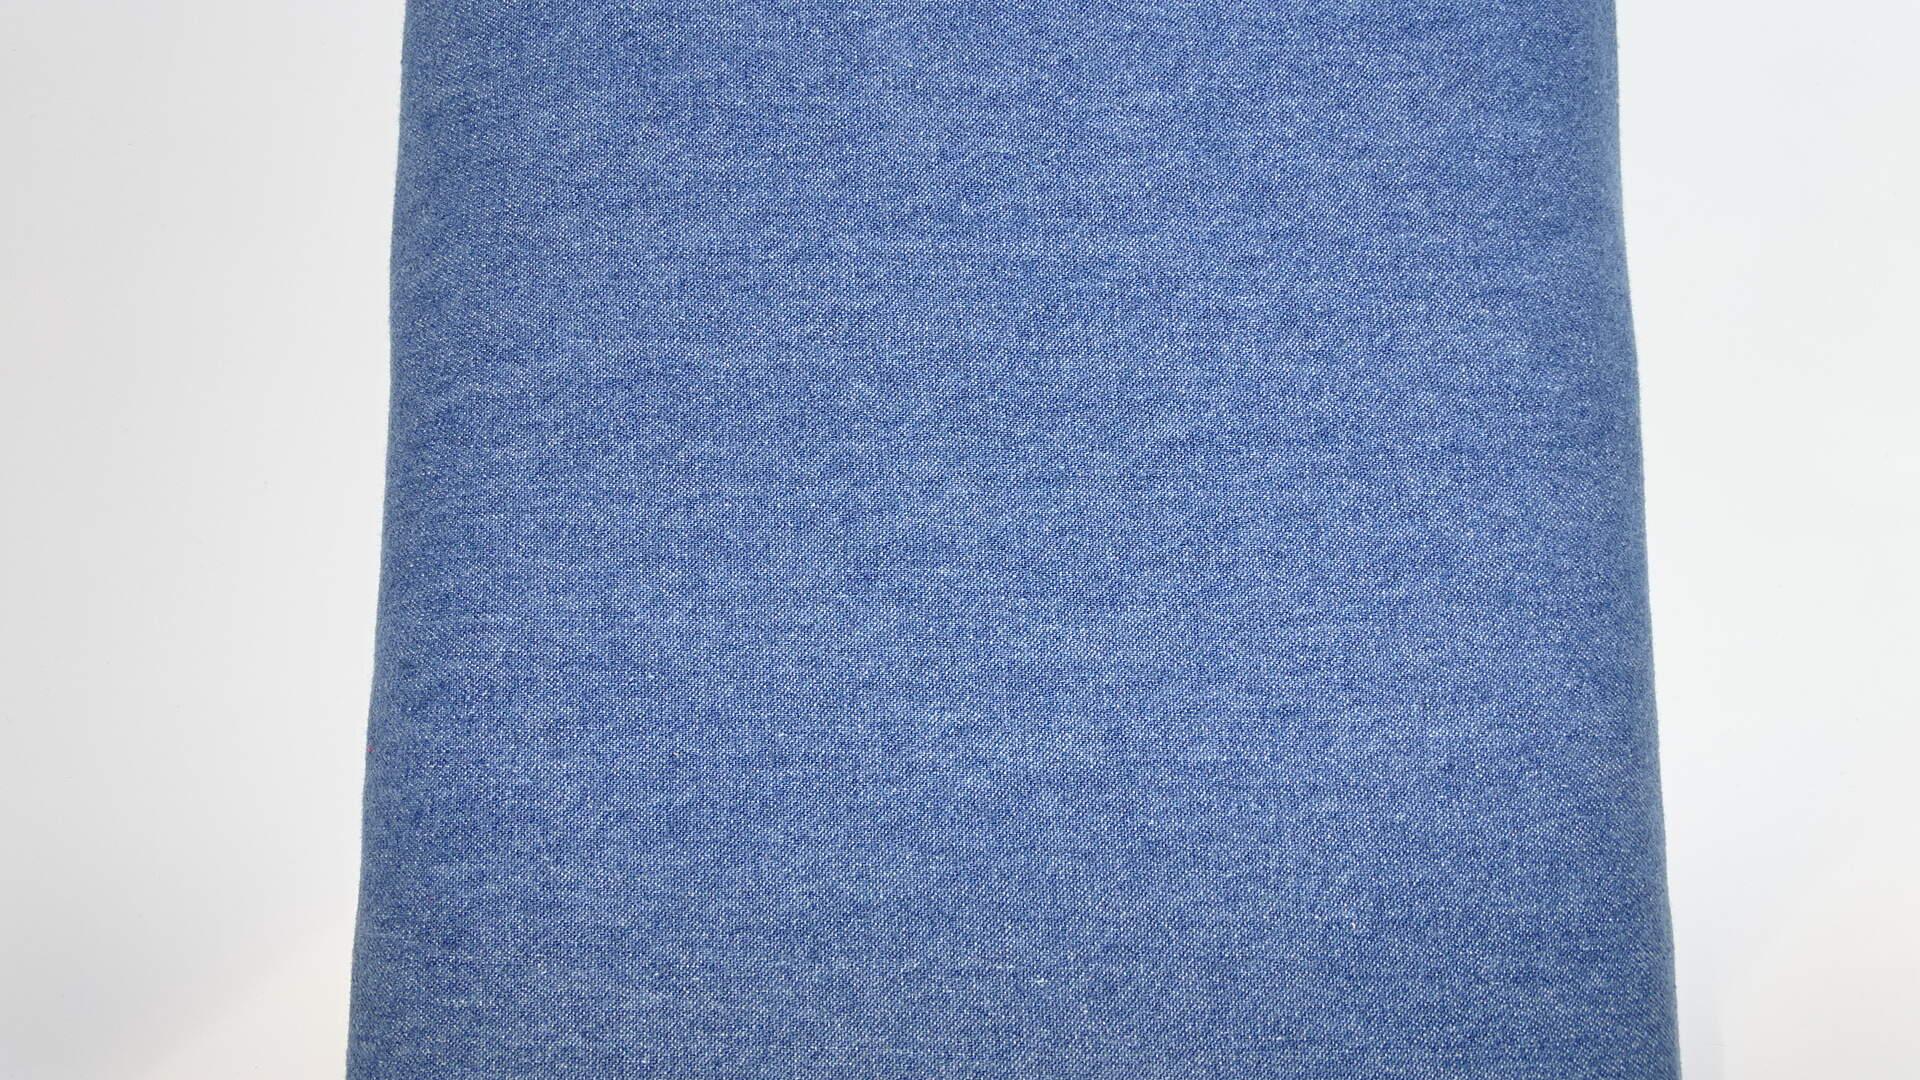 Baumwollstoff Dekostoff Denim Karo hellblau ab 50 cm